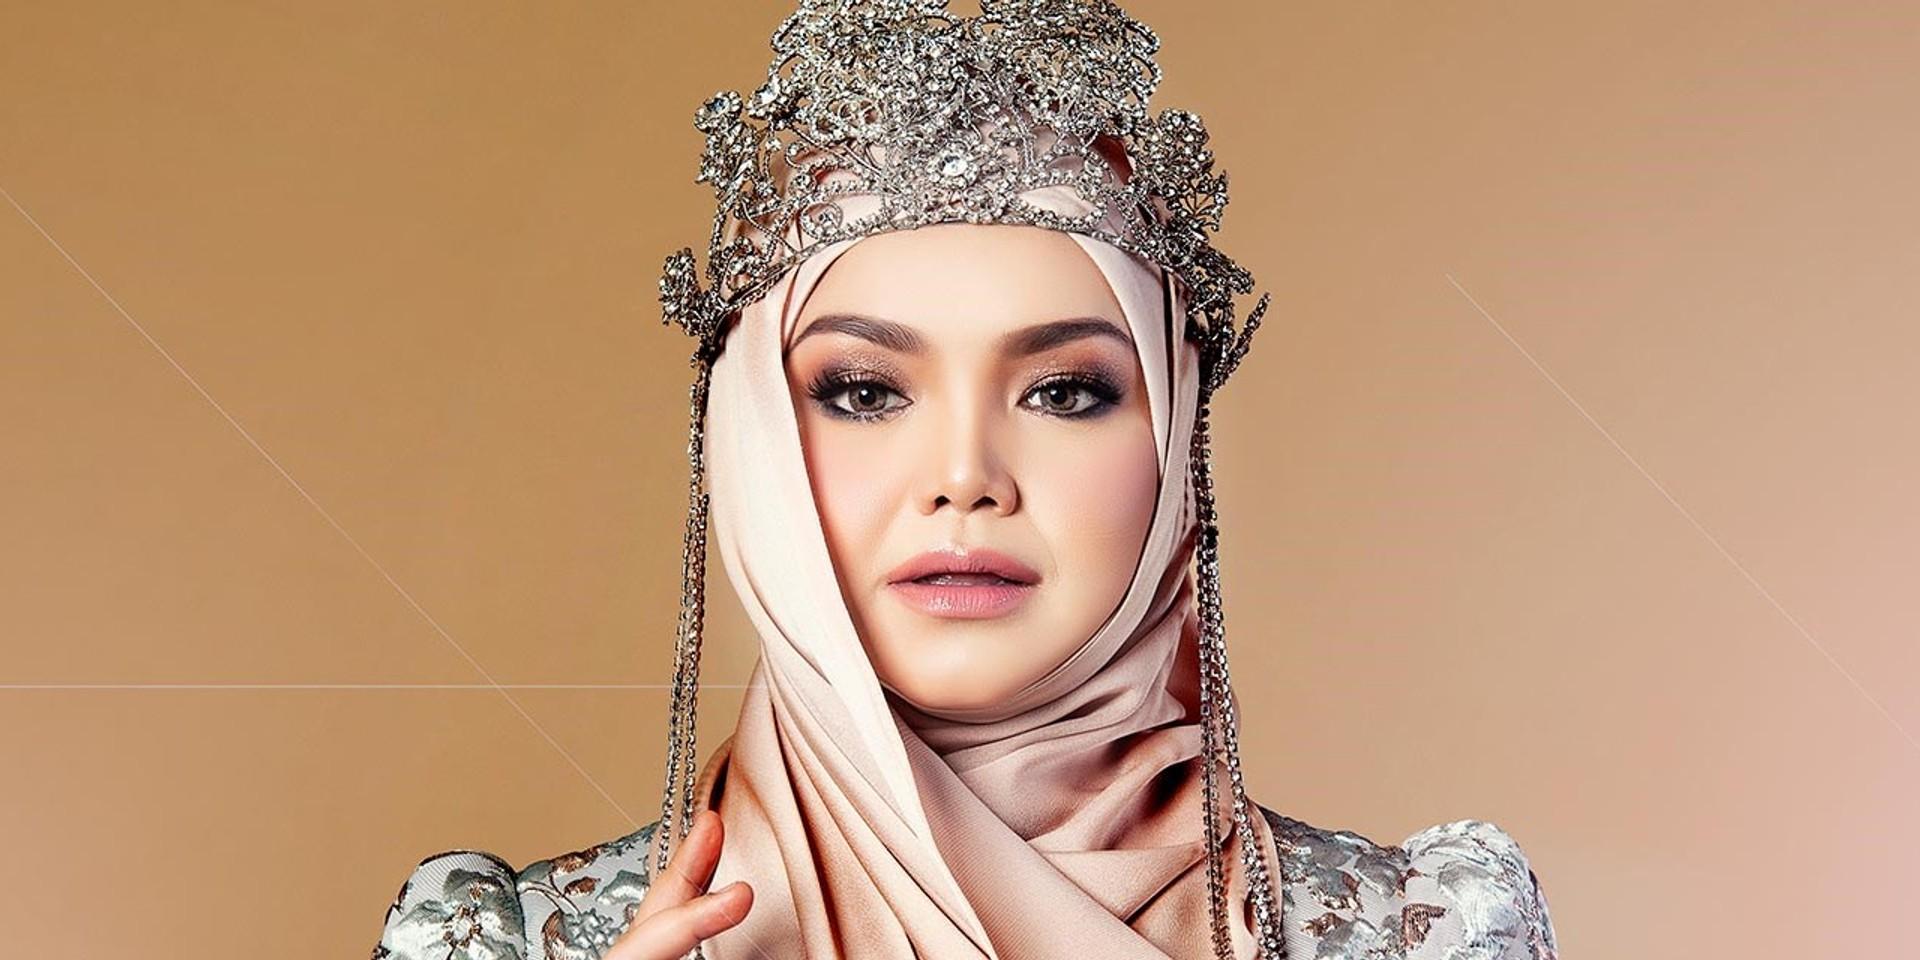 Siti Nurhaliza to perform in Adelaide, Australia in October